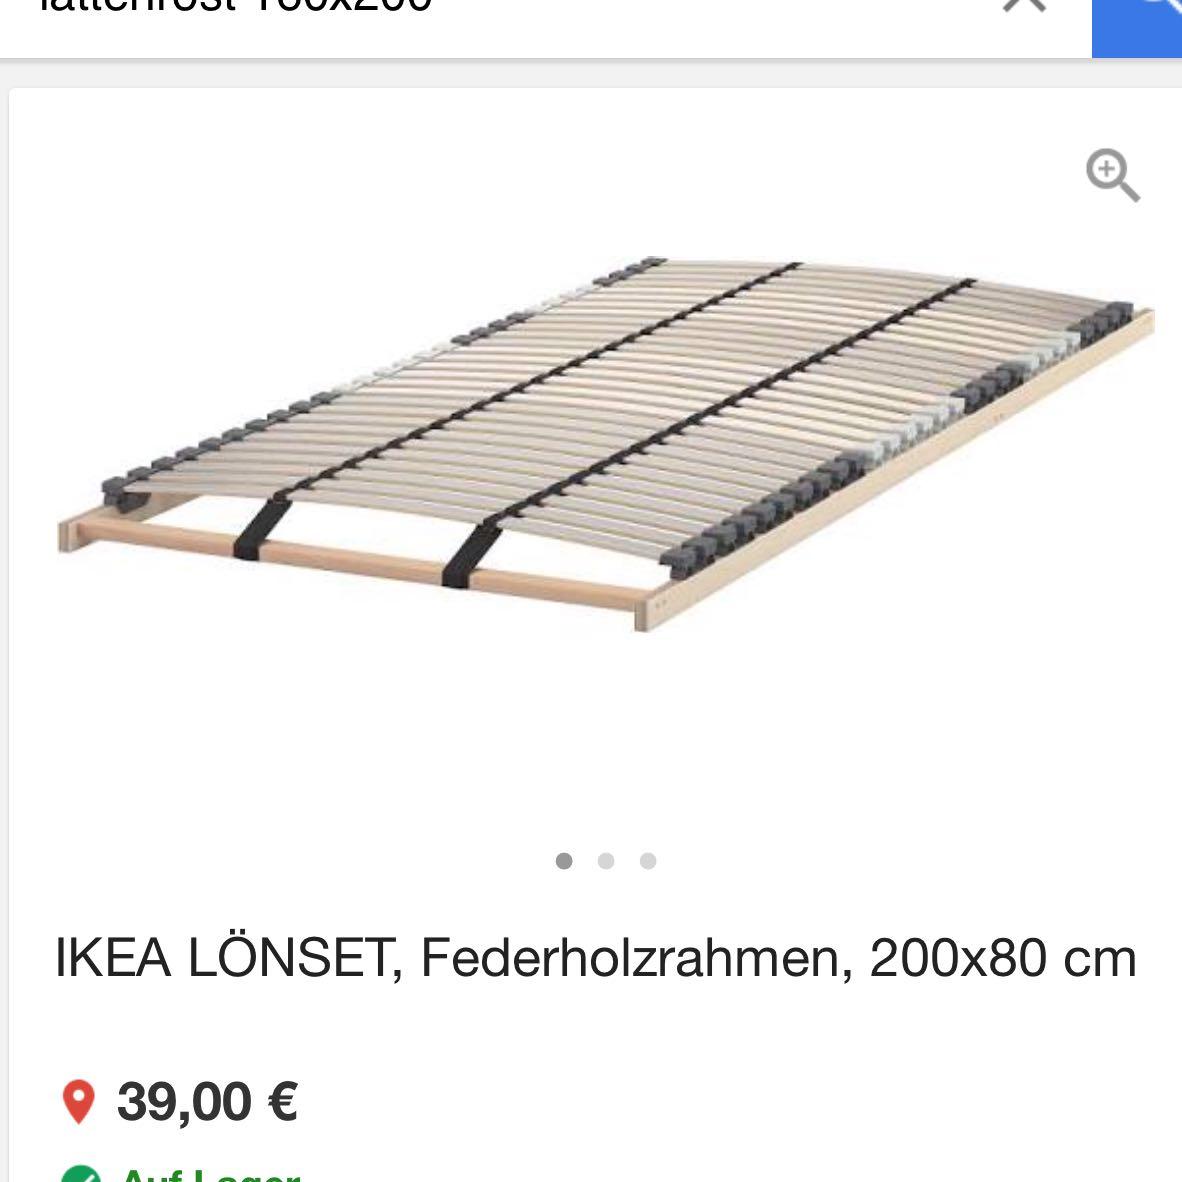 ikea lattenrost erfahrung l nset und rollrost. Black Bedroom Furniture Sets. Home Design Ideas